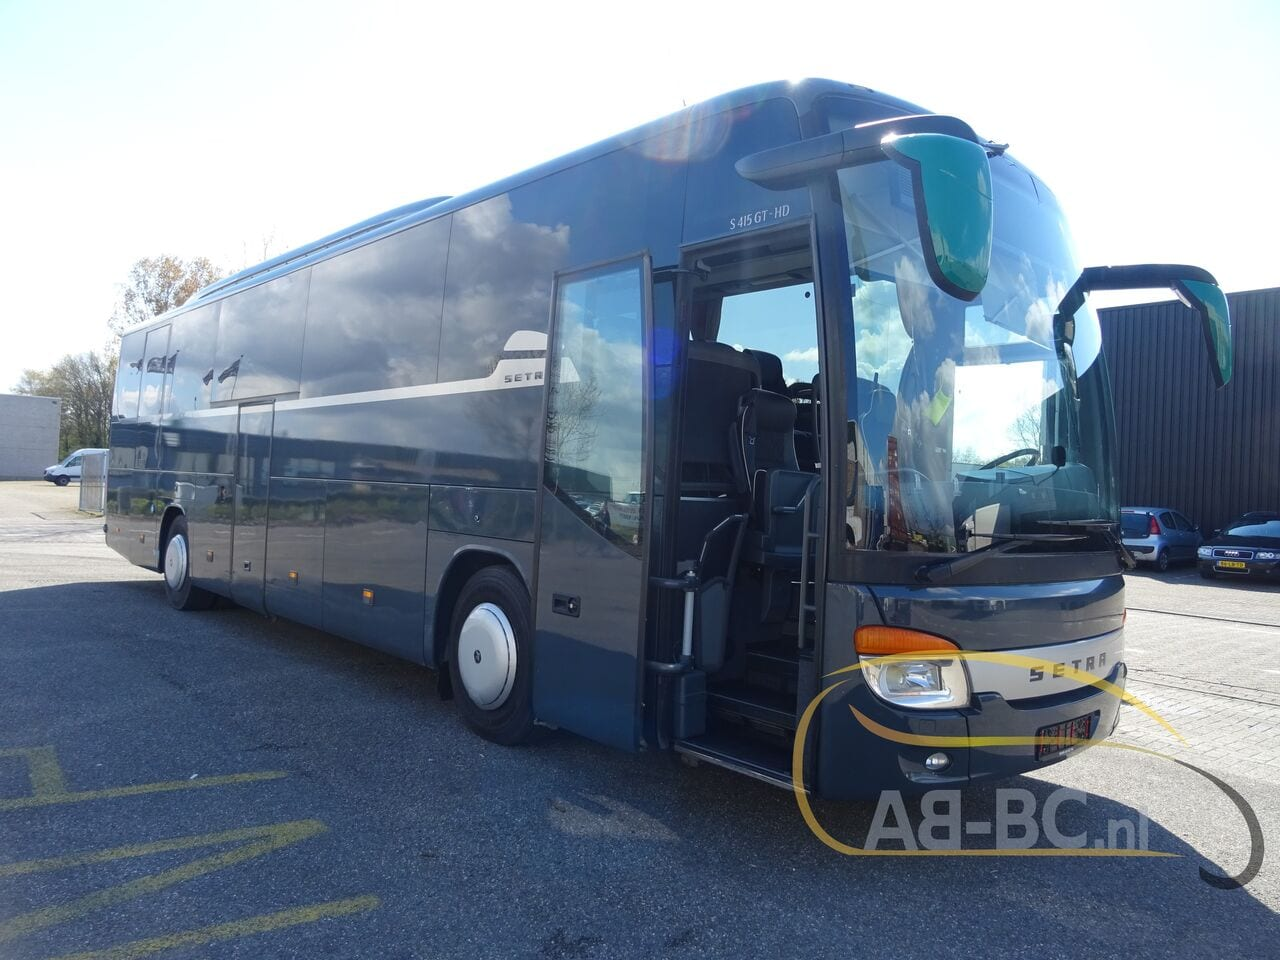 coach-busSETRA-S415-GT-HD-FINAL-EDITION-51-SEATS-LIFTBUS---1620381784802628093_big_e762b927c71430a82c54dd89c6af6728--21050713010665719300